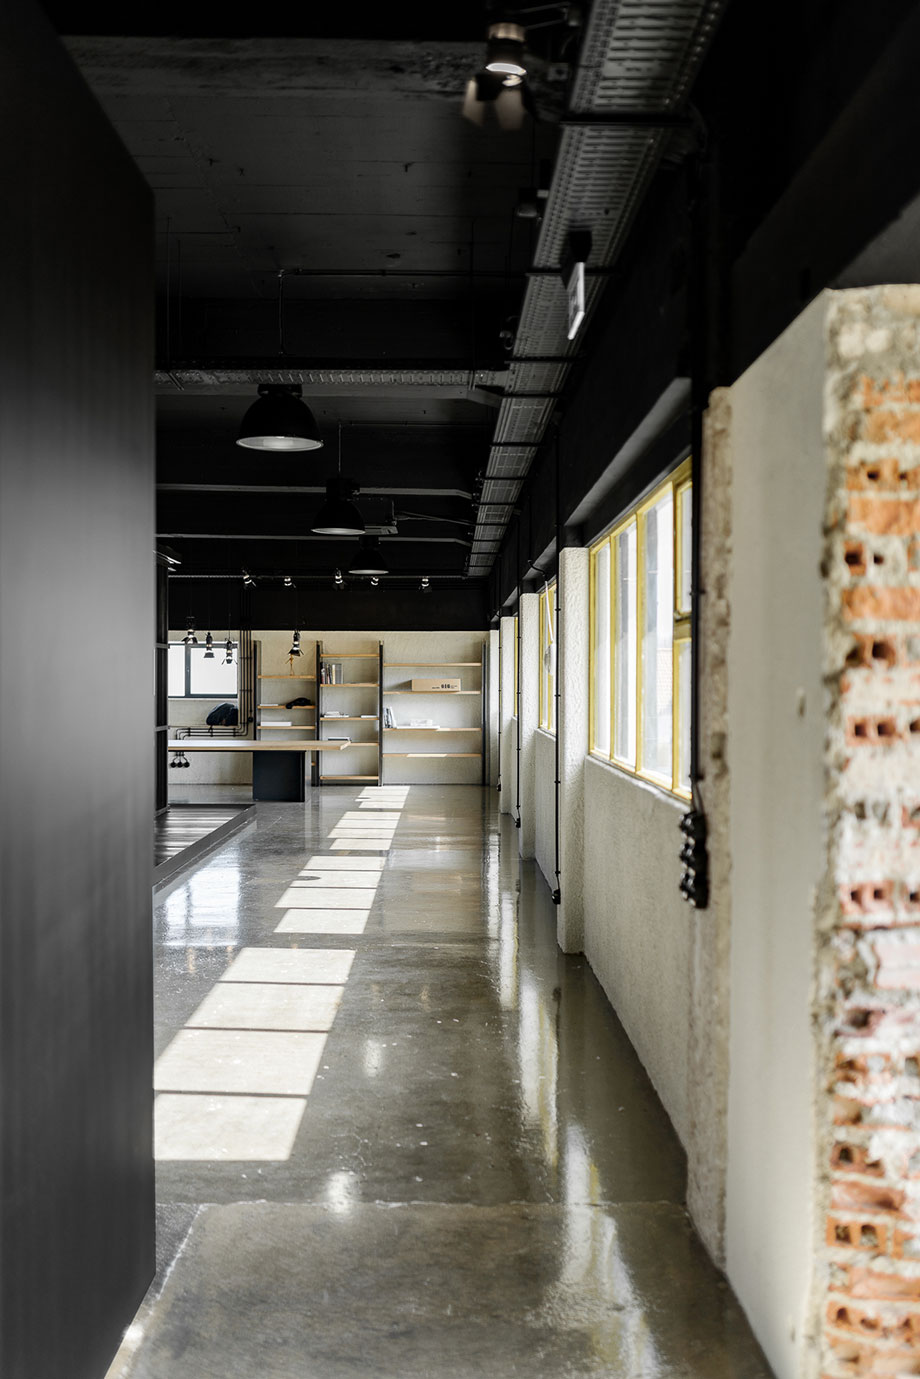 atelier das artes 16 de mmvarquitectos (3) - foto ricardo oliveira alves